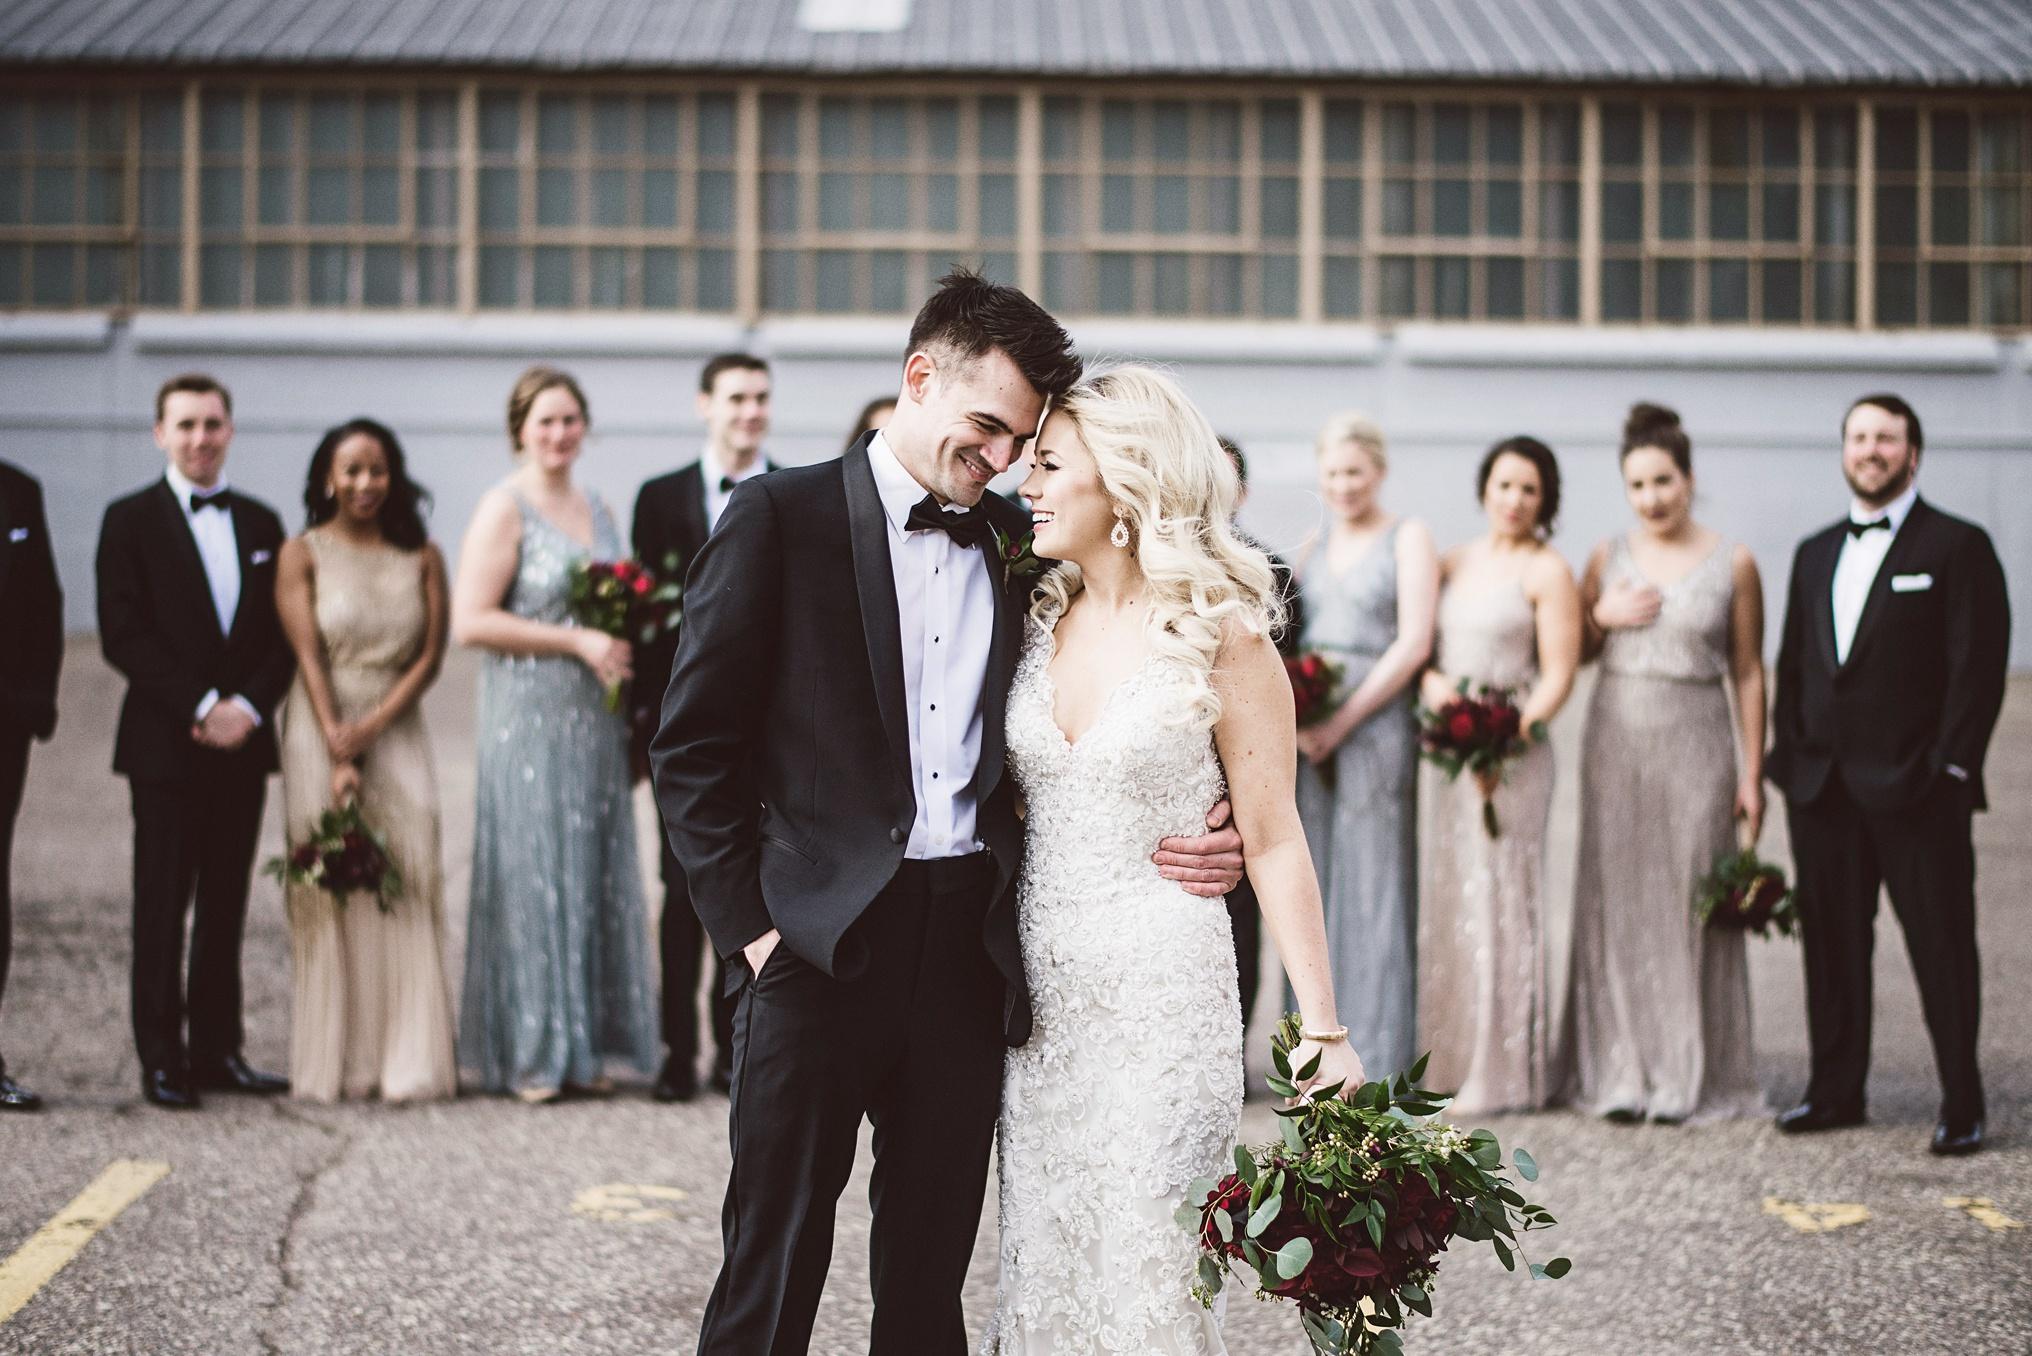 best_wedding_photography_2017_by_lucas_botz_photography_116.jpg